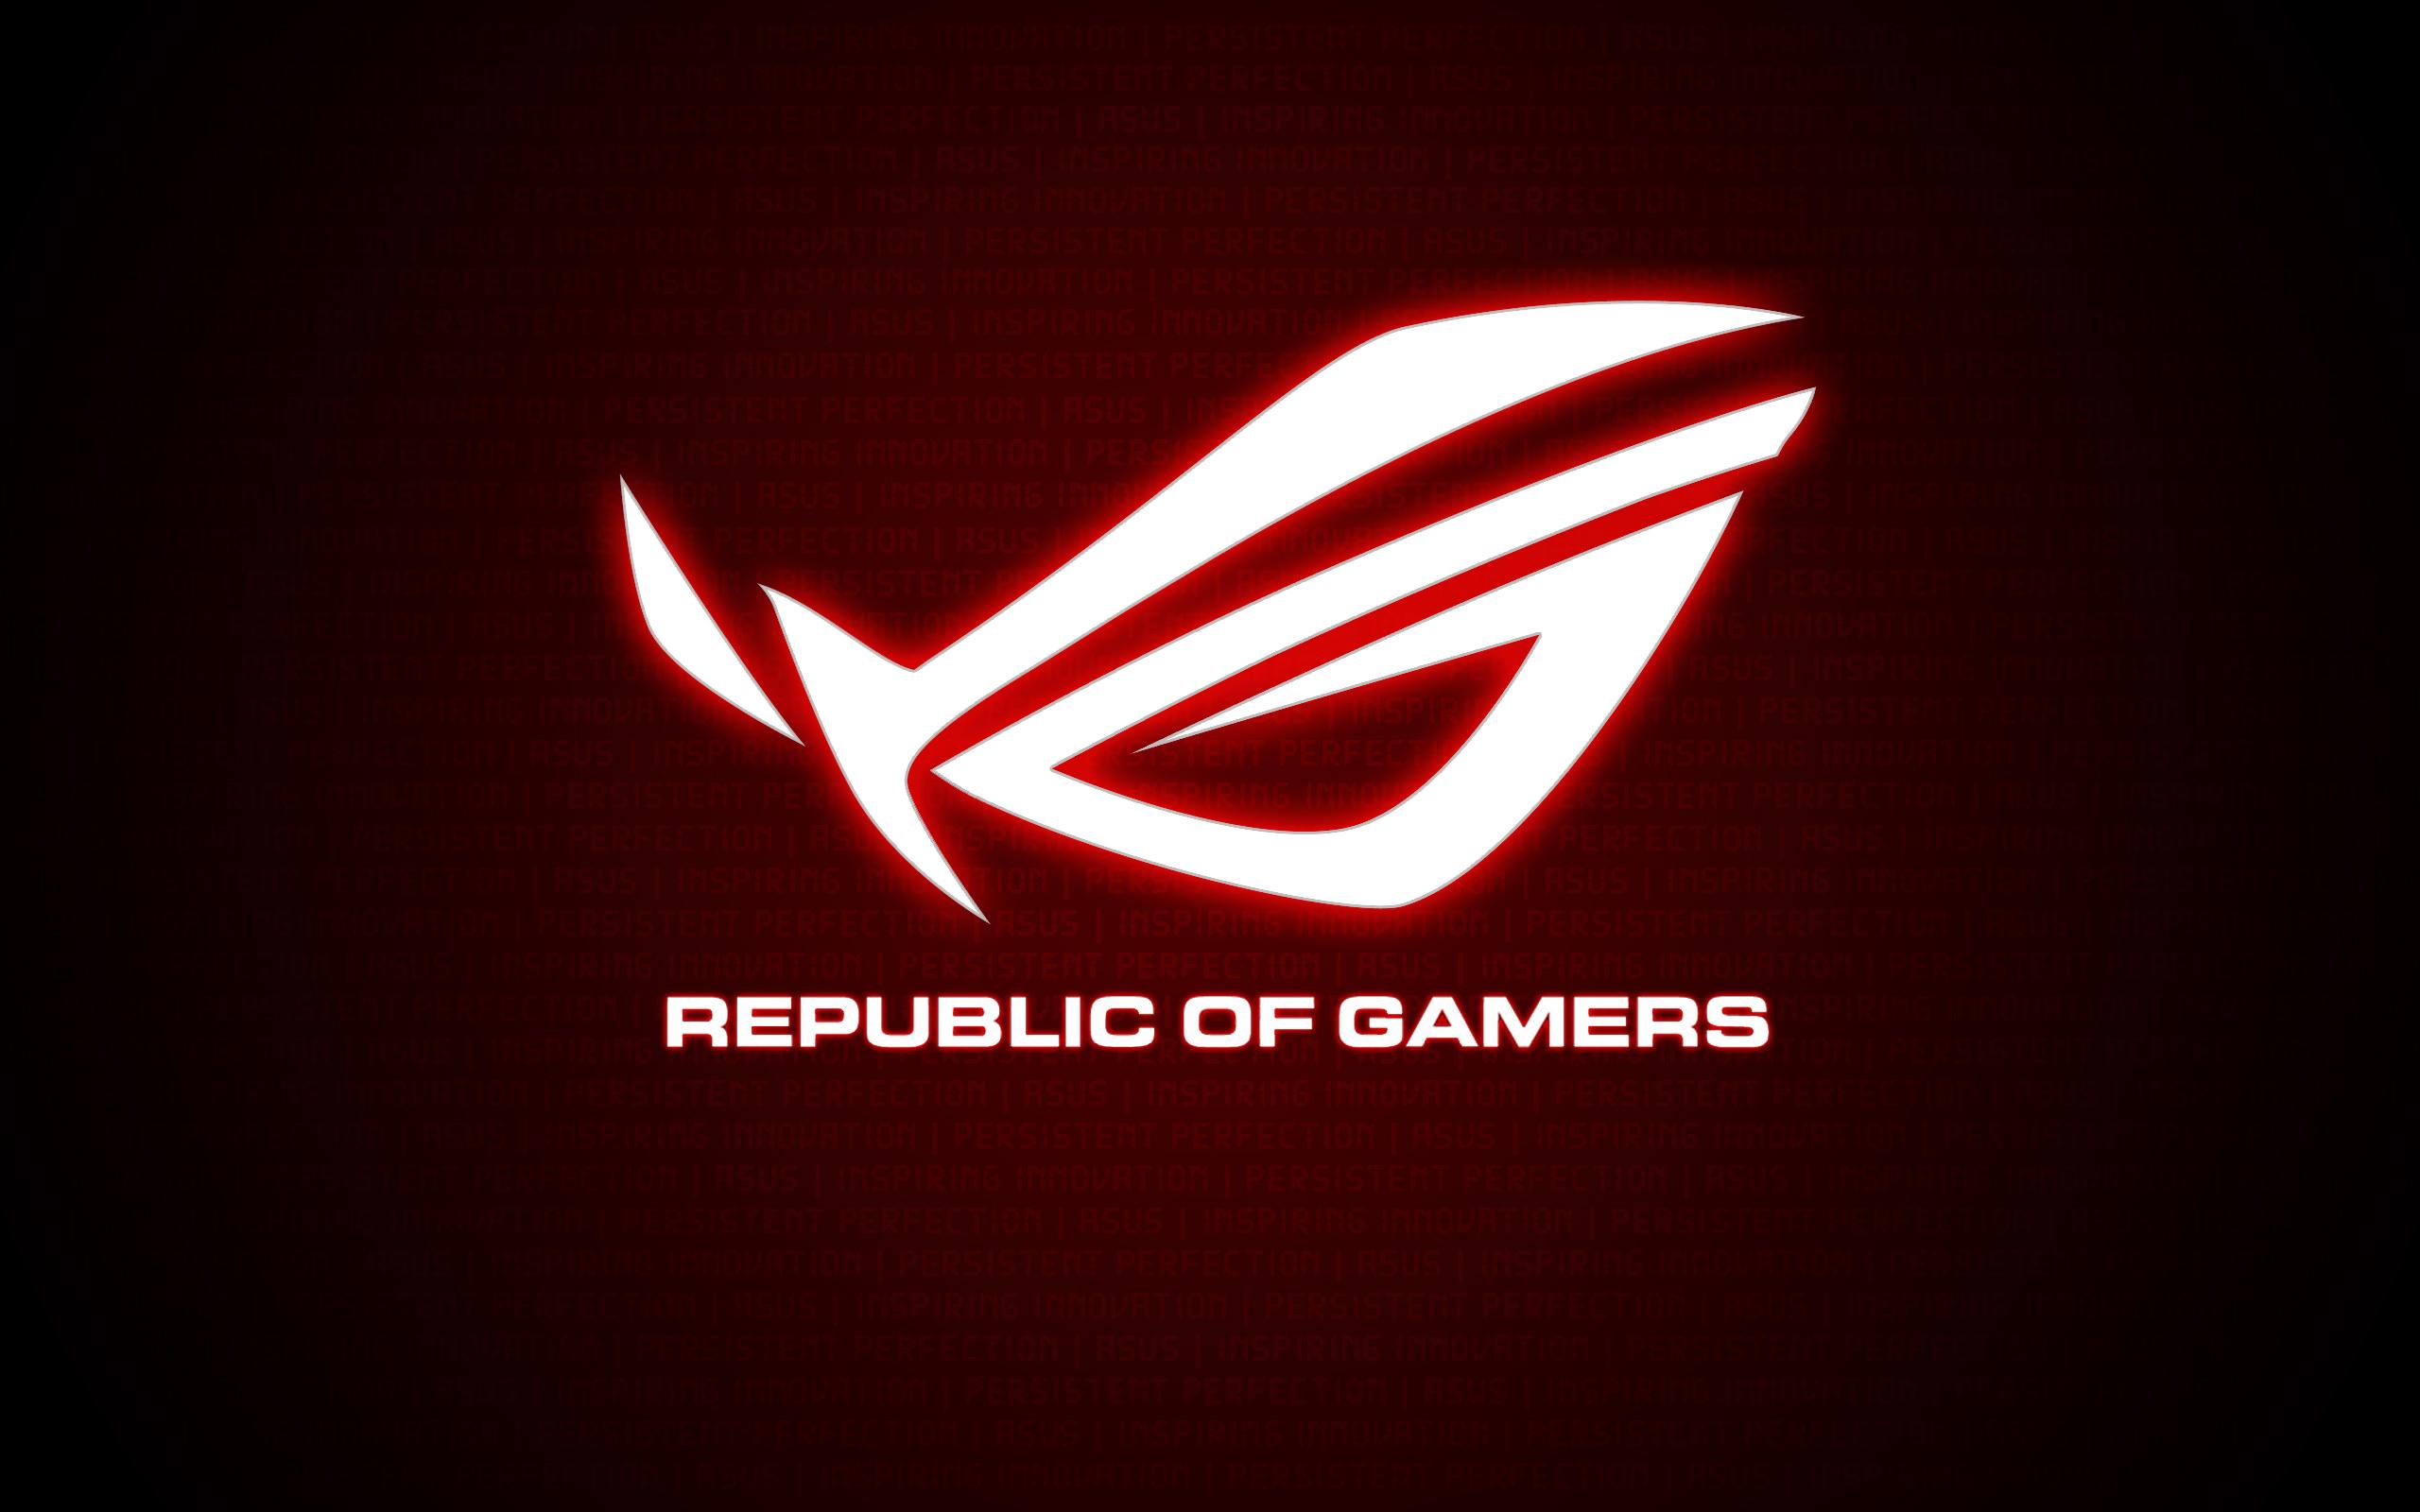 Alf img   Showing Republic of Gamers Screensaver 2560x1600